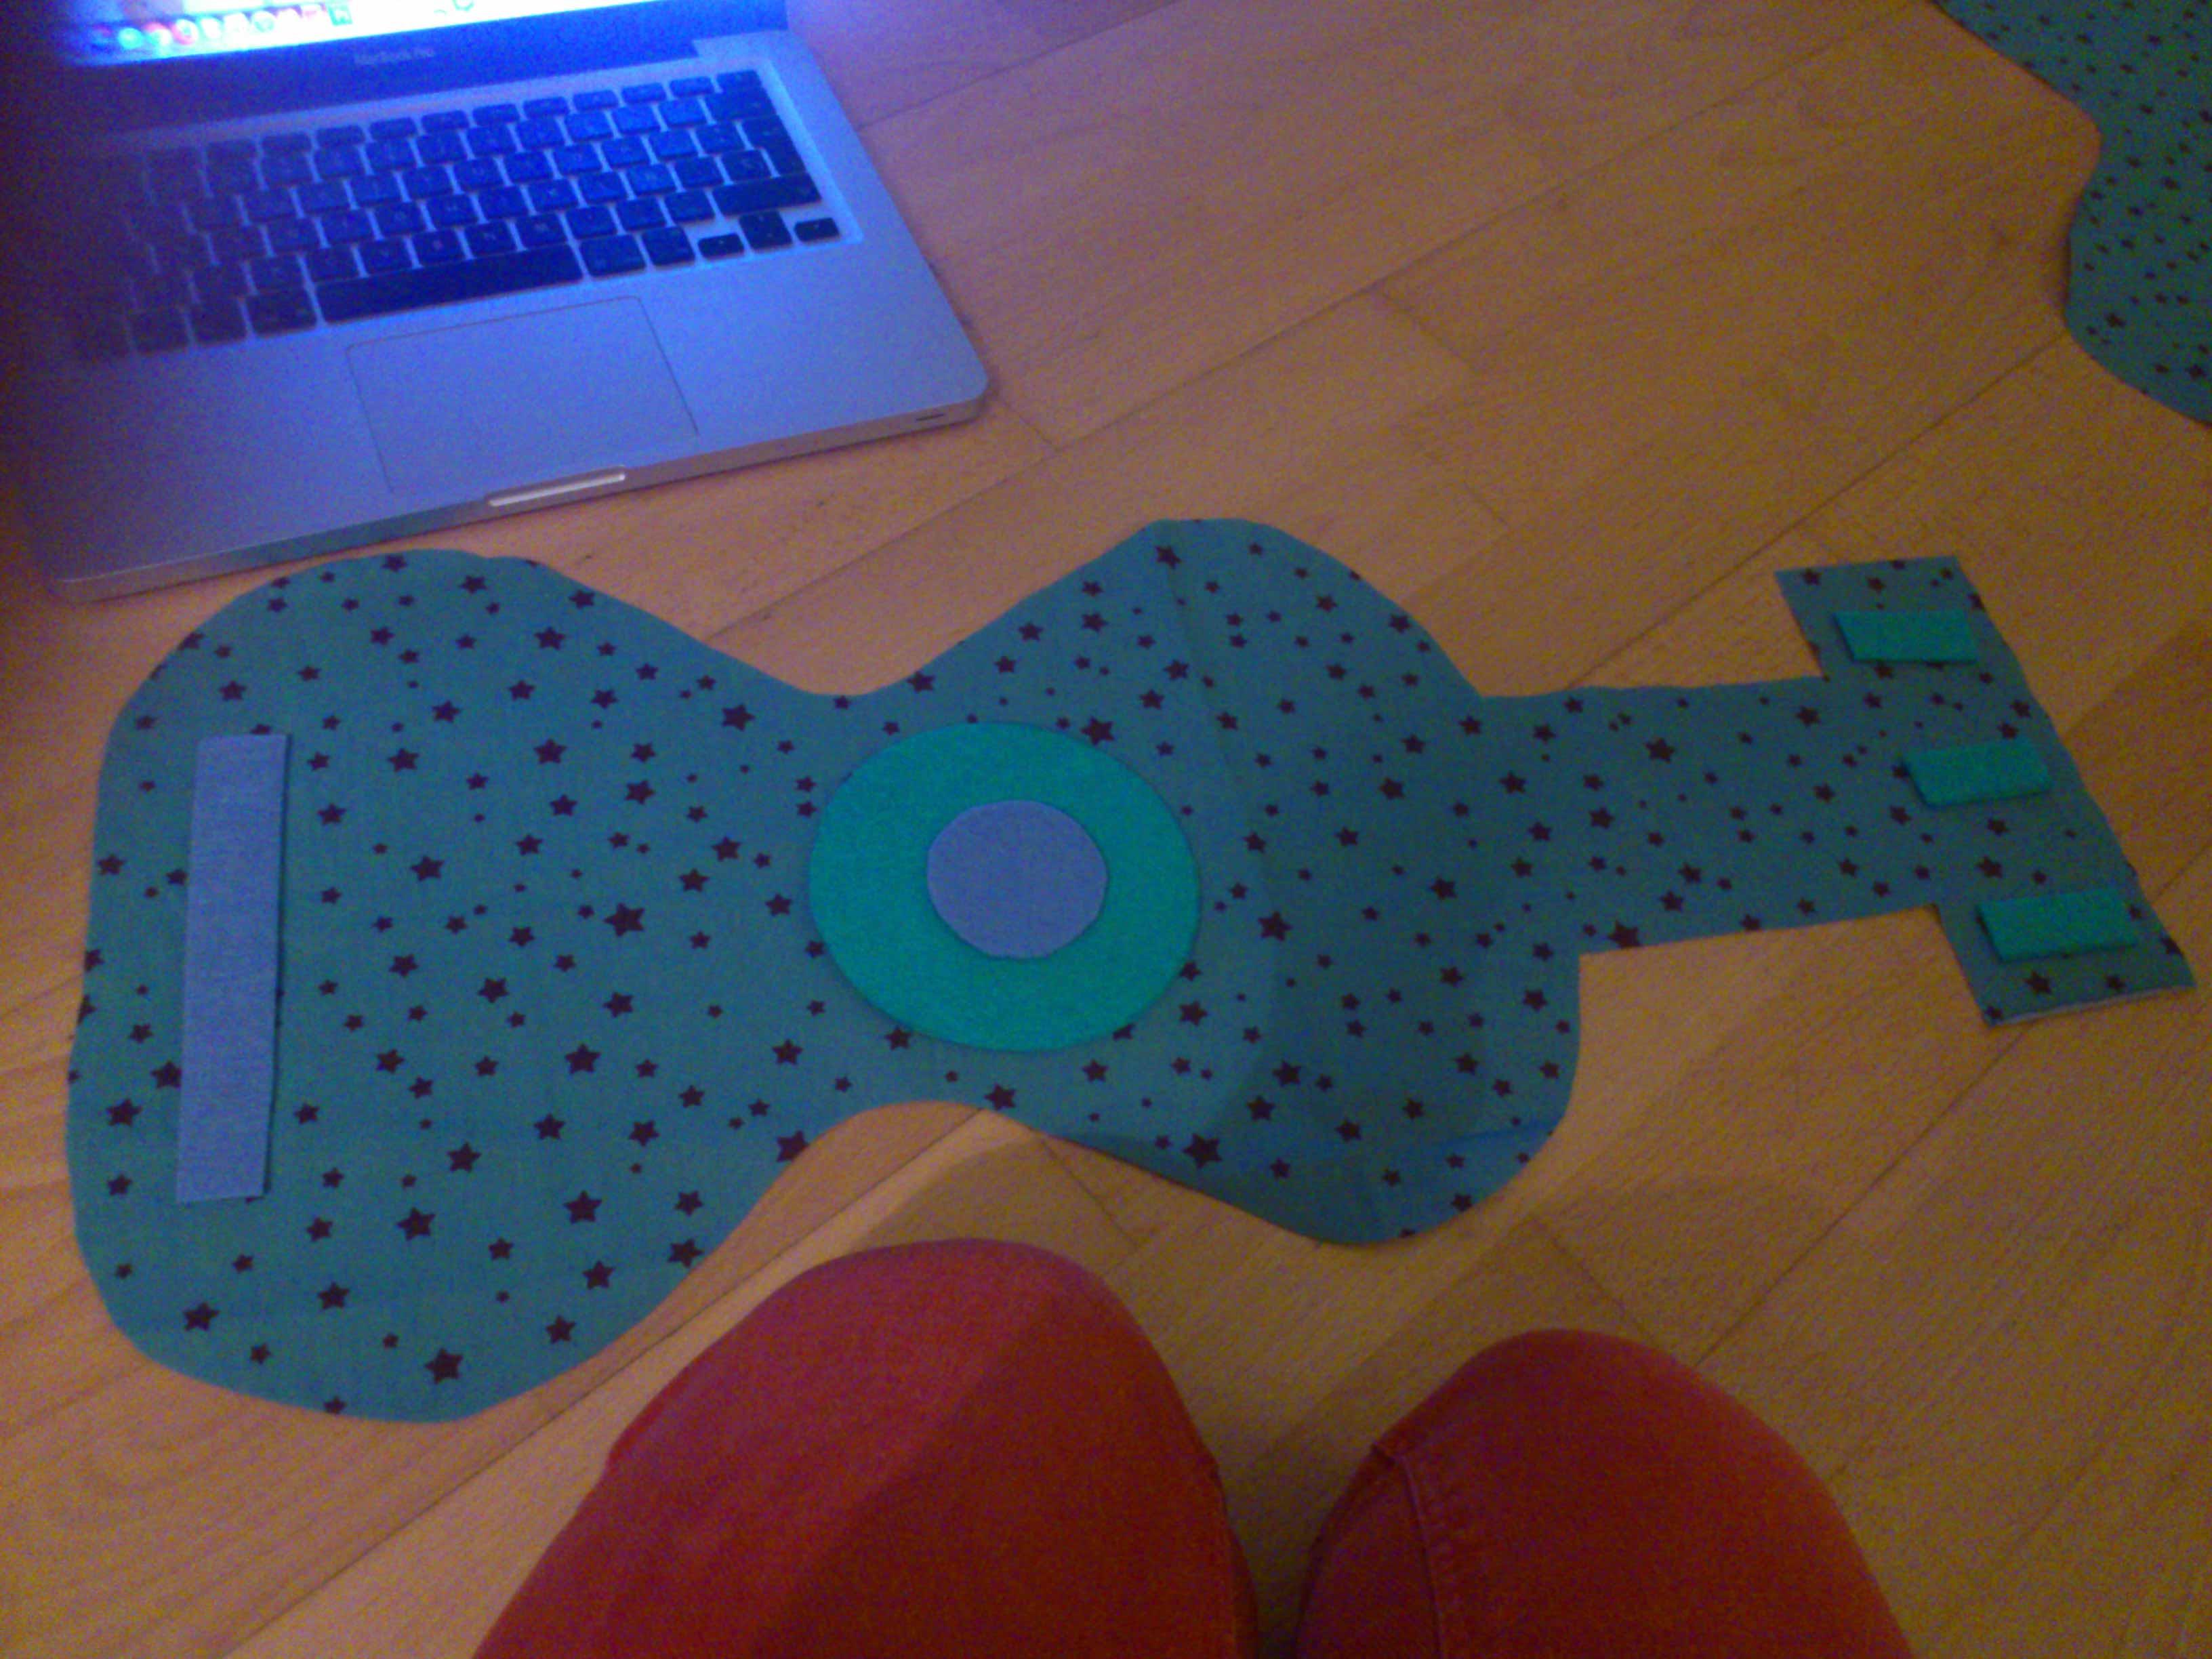 ♡ Tuto : La guitare taille-de-guêpe ou la guitare/violon en tissu  ♡ Tuto : La guitare taille-de-guêpe ou la guitare/violon en tissu  ♡ Tuto : La guitare taille-de-guêpe ou la guitare/violon en tissu  ♡ Tuto : La guitare taille-de-guêpe ou la guitare/violon en tissu  ♡ Tuto : La guitare taille-de-guêpe ou la guitare/violon en tissu  ♡ Tuto : La guitare taille-de-guêpe ou la guitare/violon en tissu  ♡ Tuto : La guitare taille-de-guêpe ou la guitare/violon en tissu